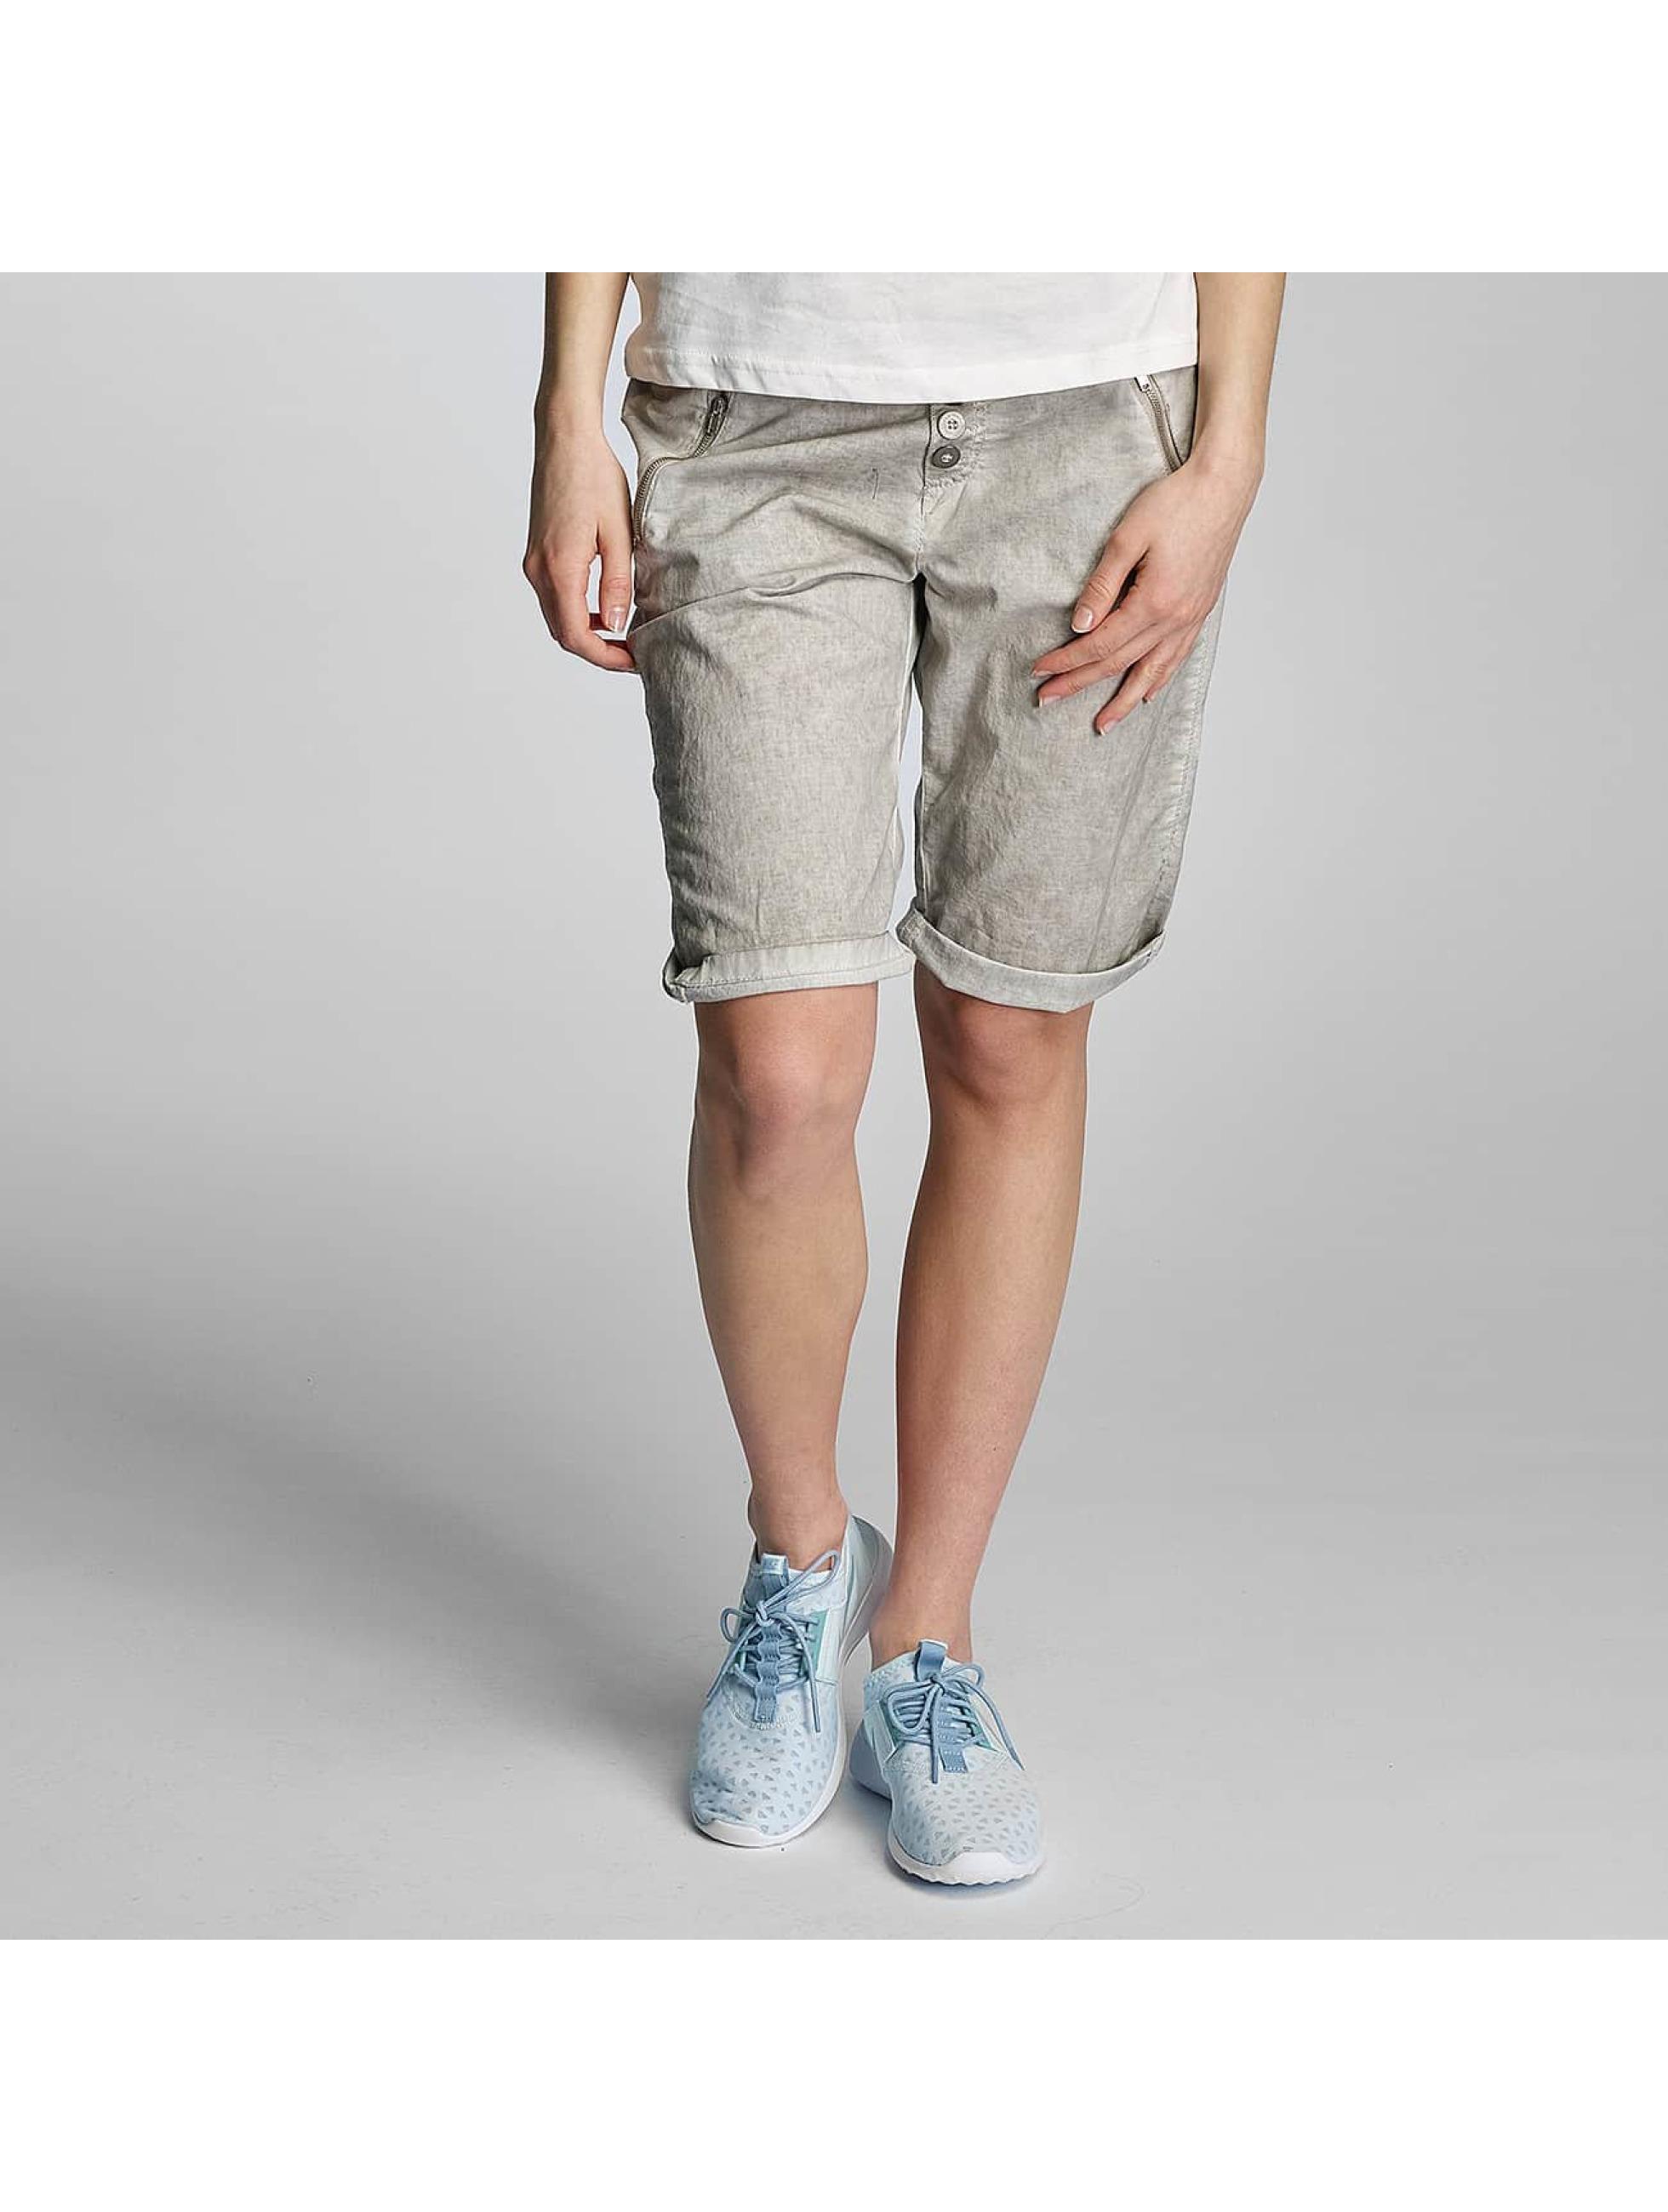 Sublevel Frauen Shorts Pepita in grau